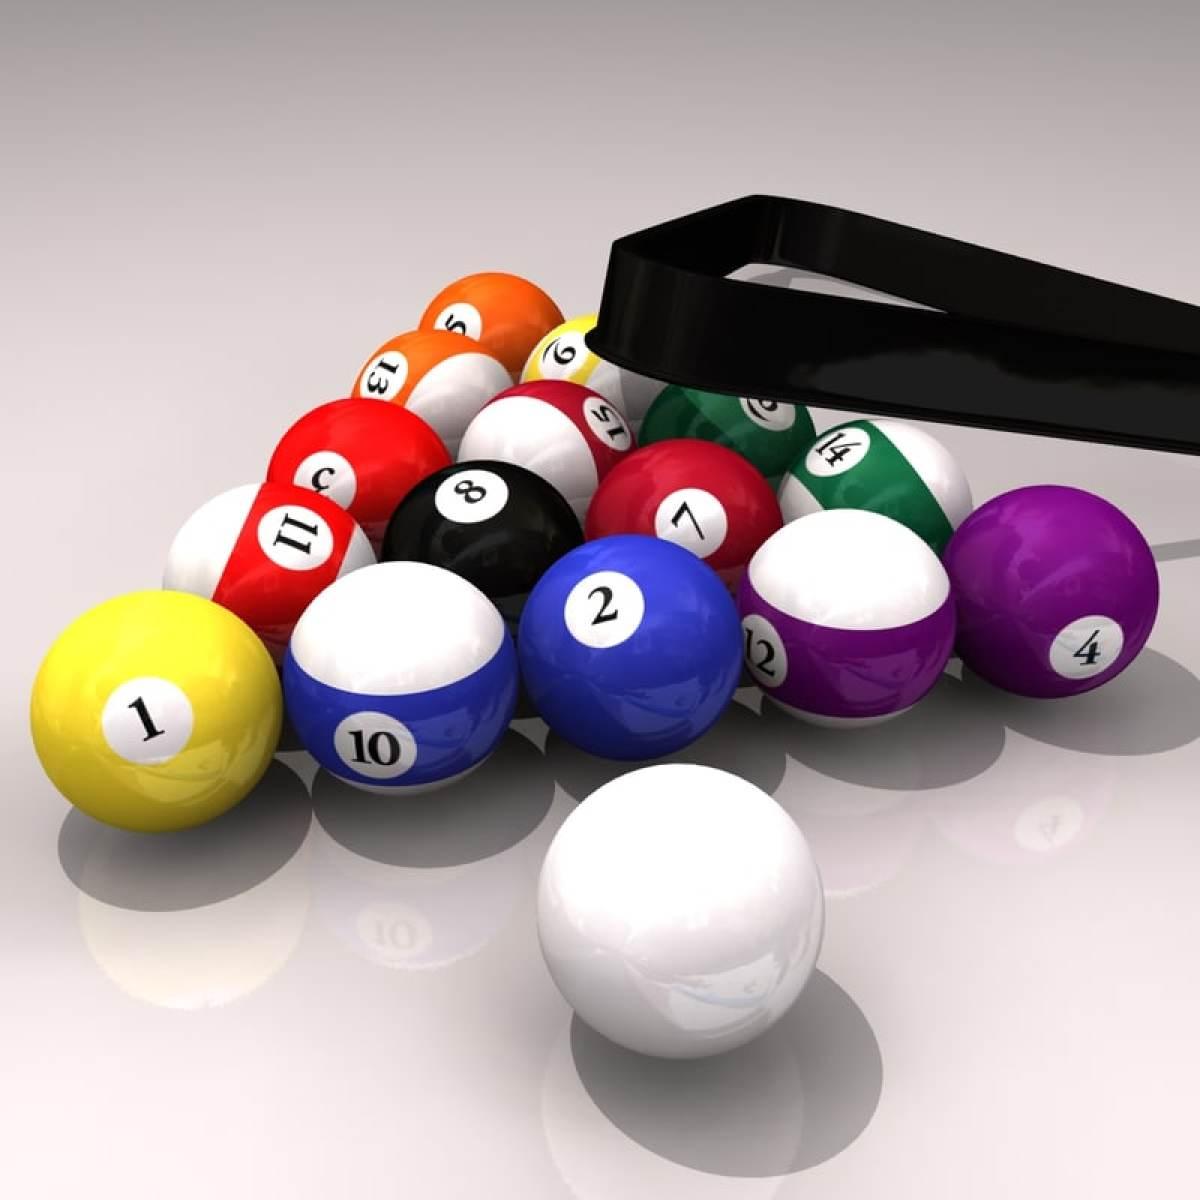 billiard balls 3d models and textures   turbosquid